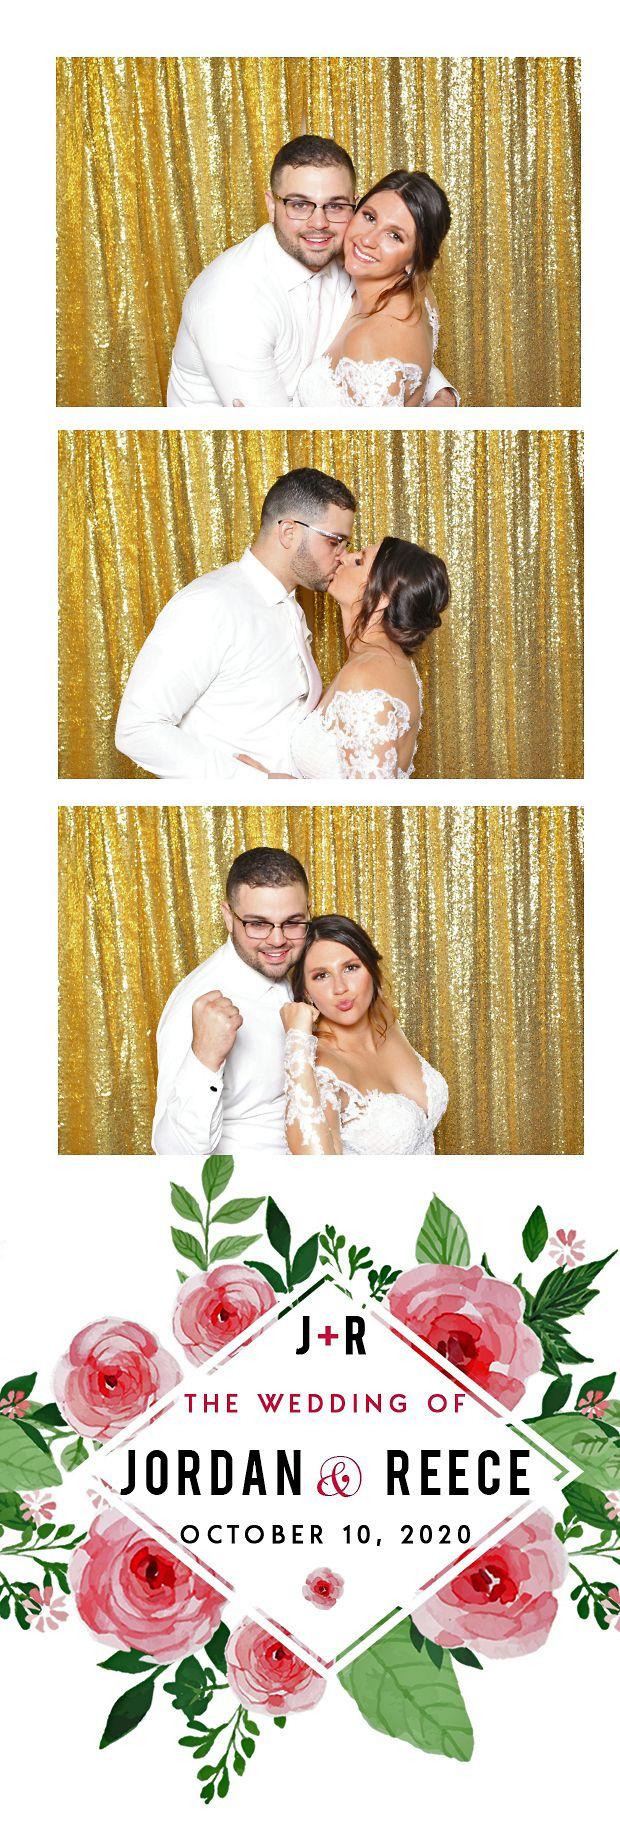 The Wedding of Jordan & Reece